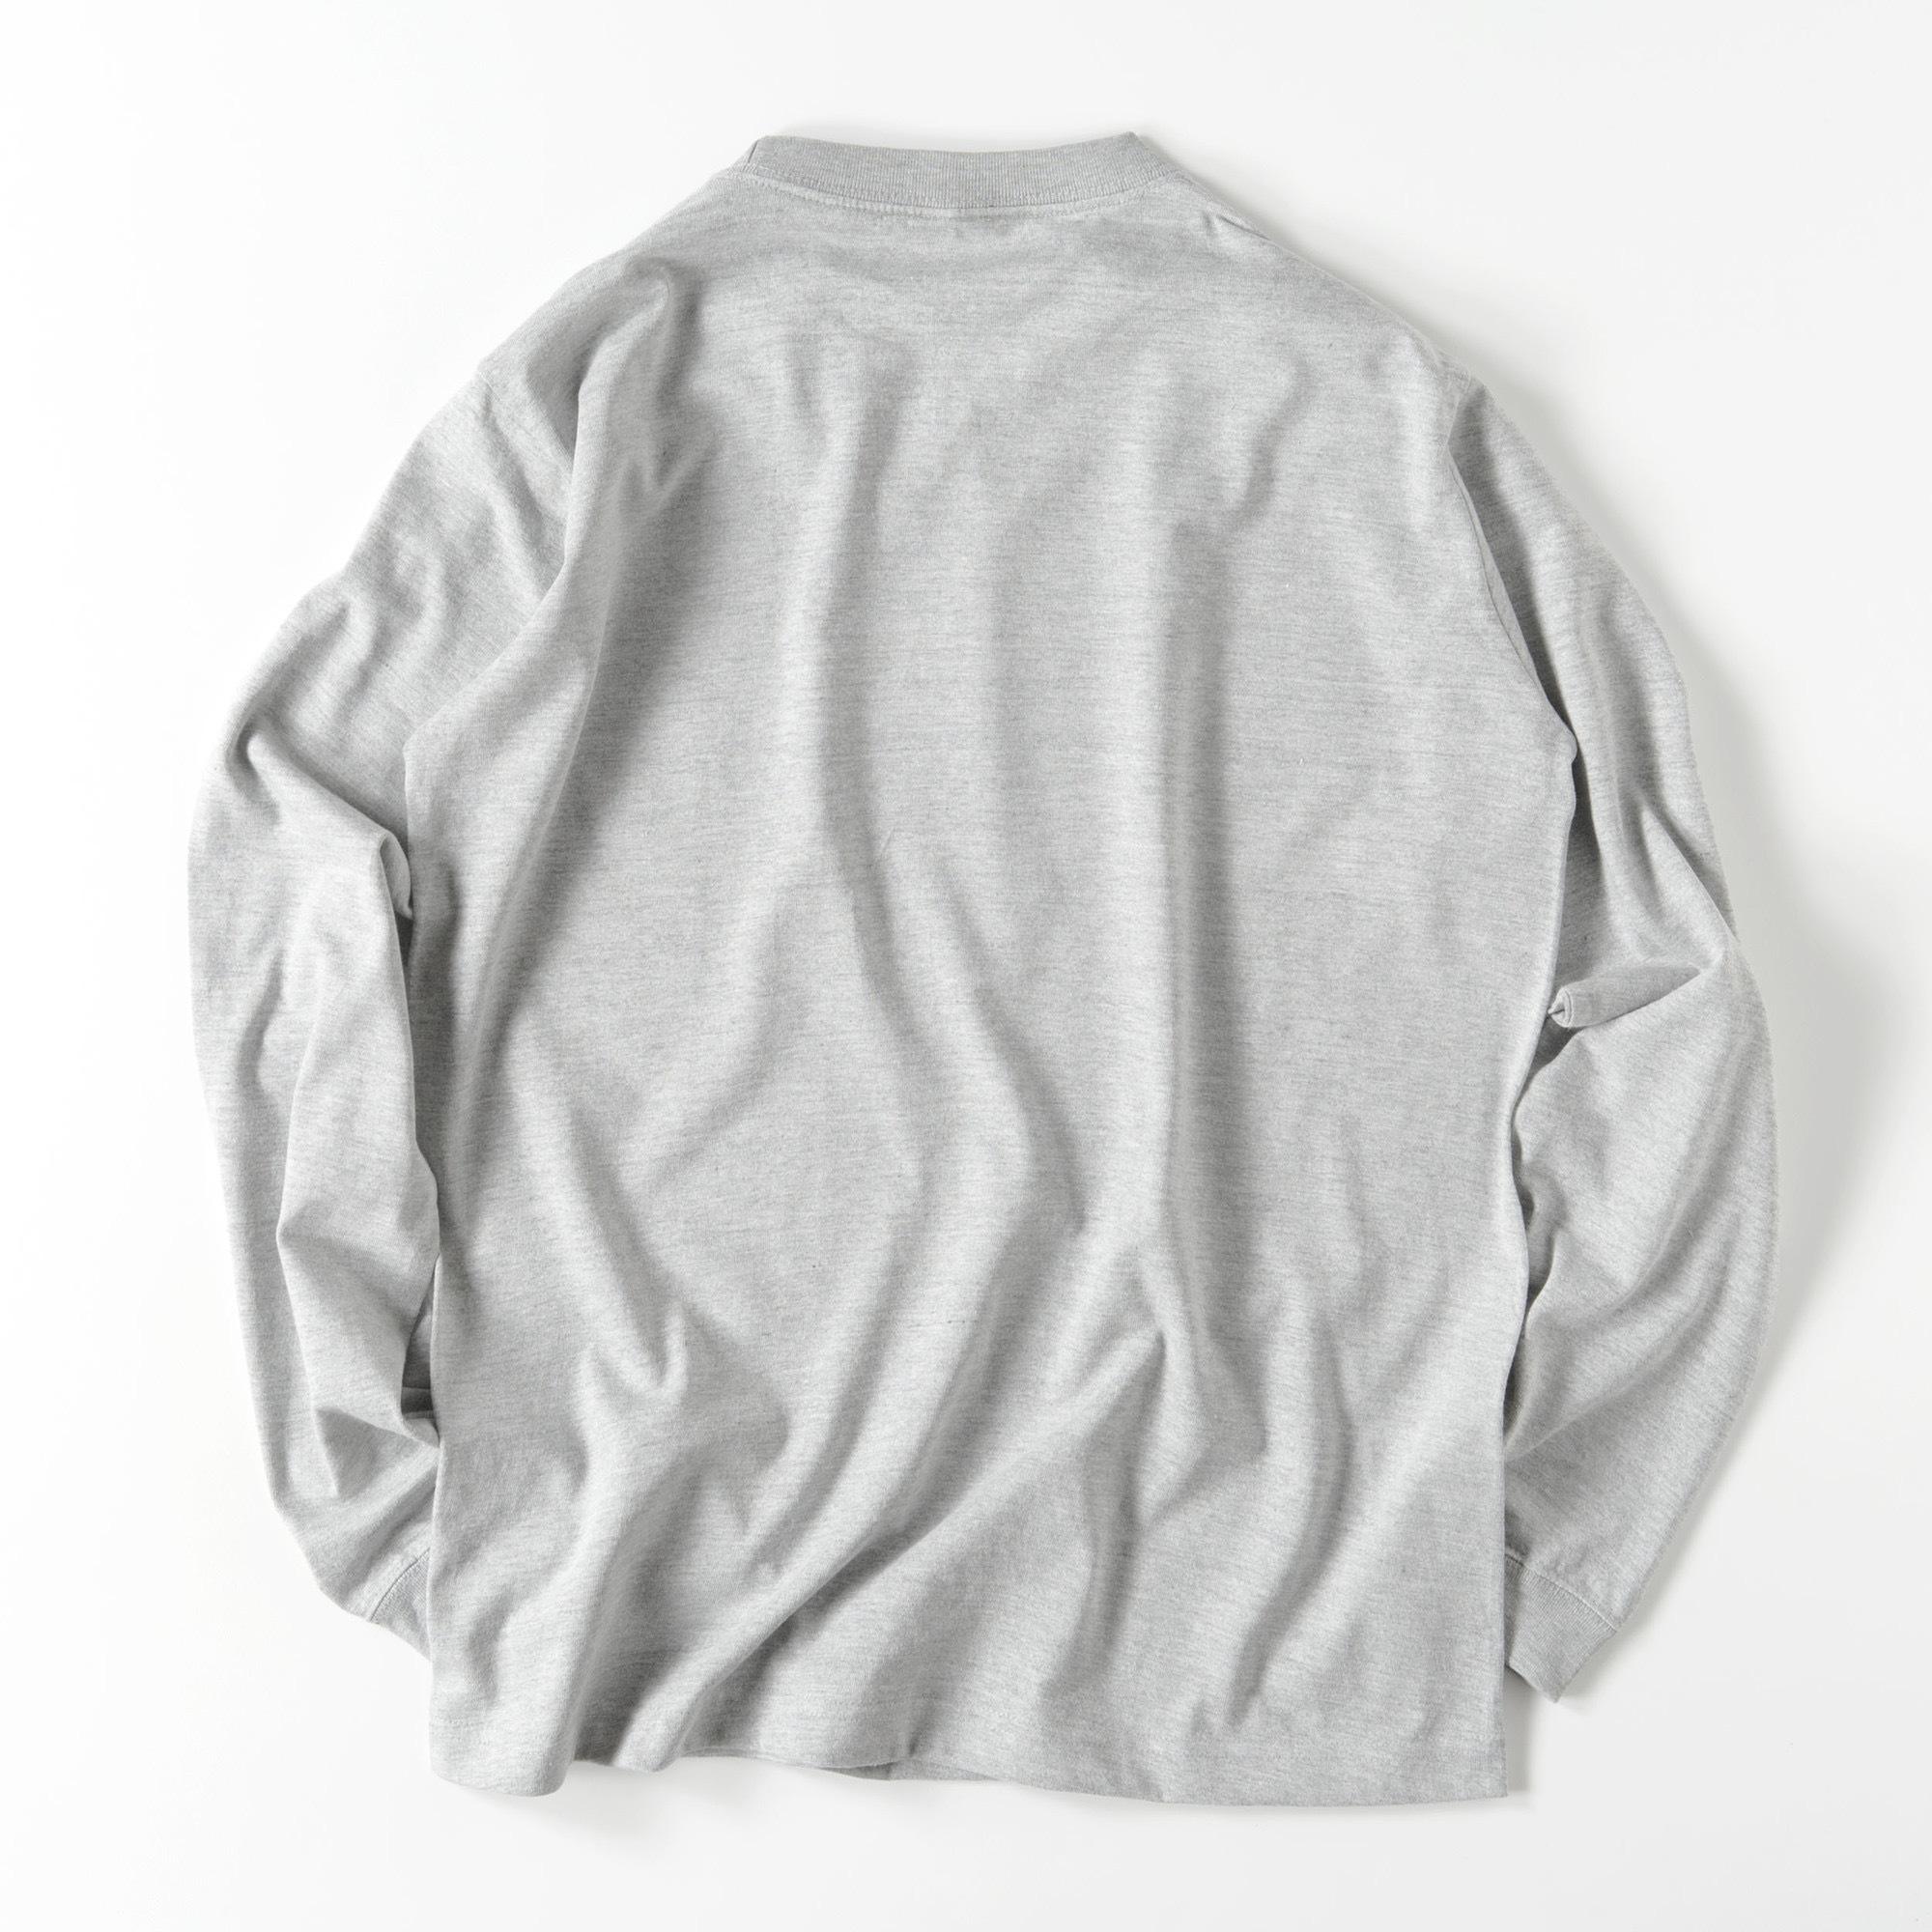 STAR_WAY/GRY/モノトーン【シンプルデザインTシャツ】©mayu_color.888